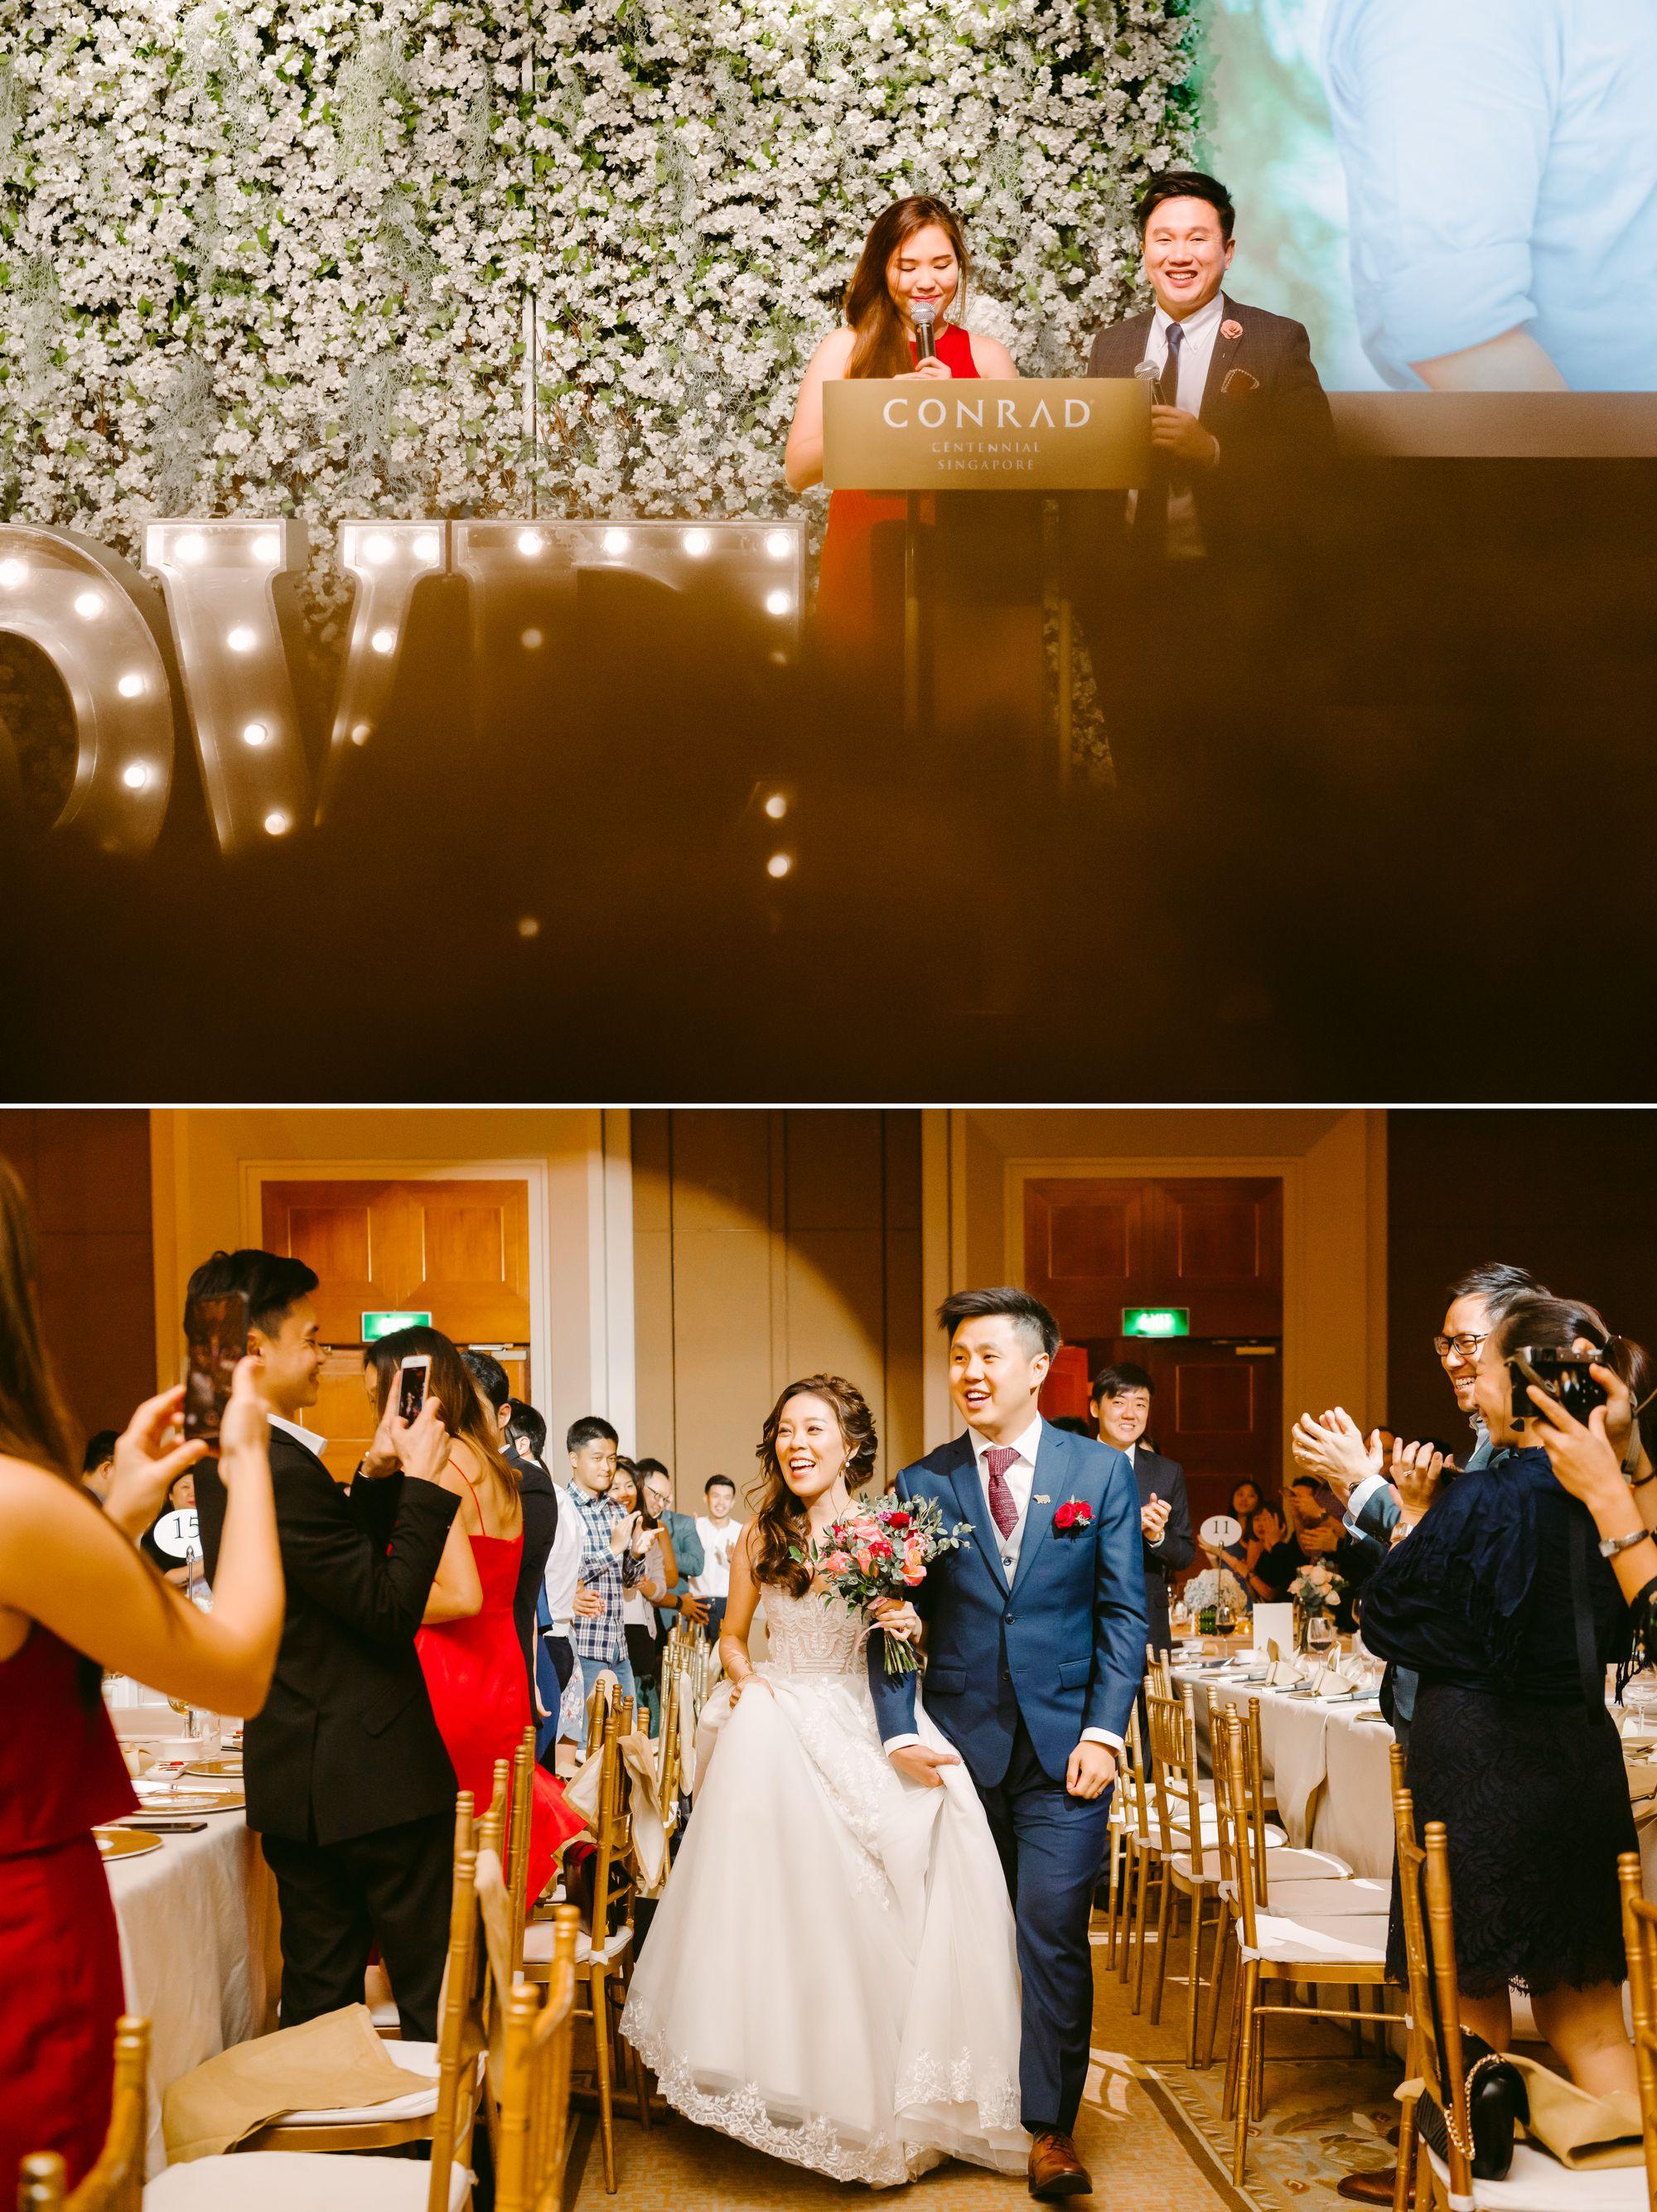 conrad_wedding_Singapore_ 34.jpg